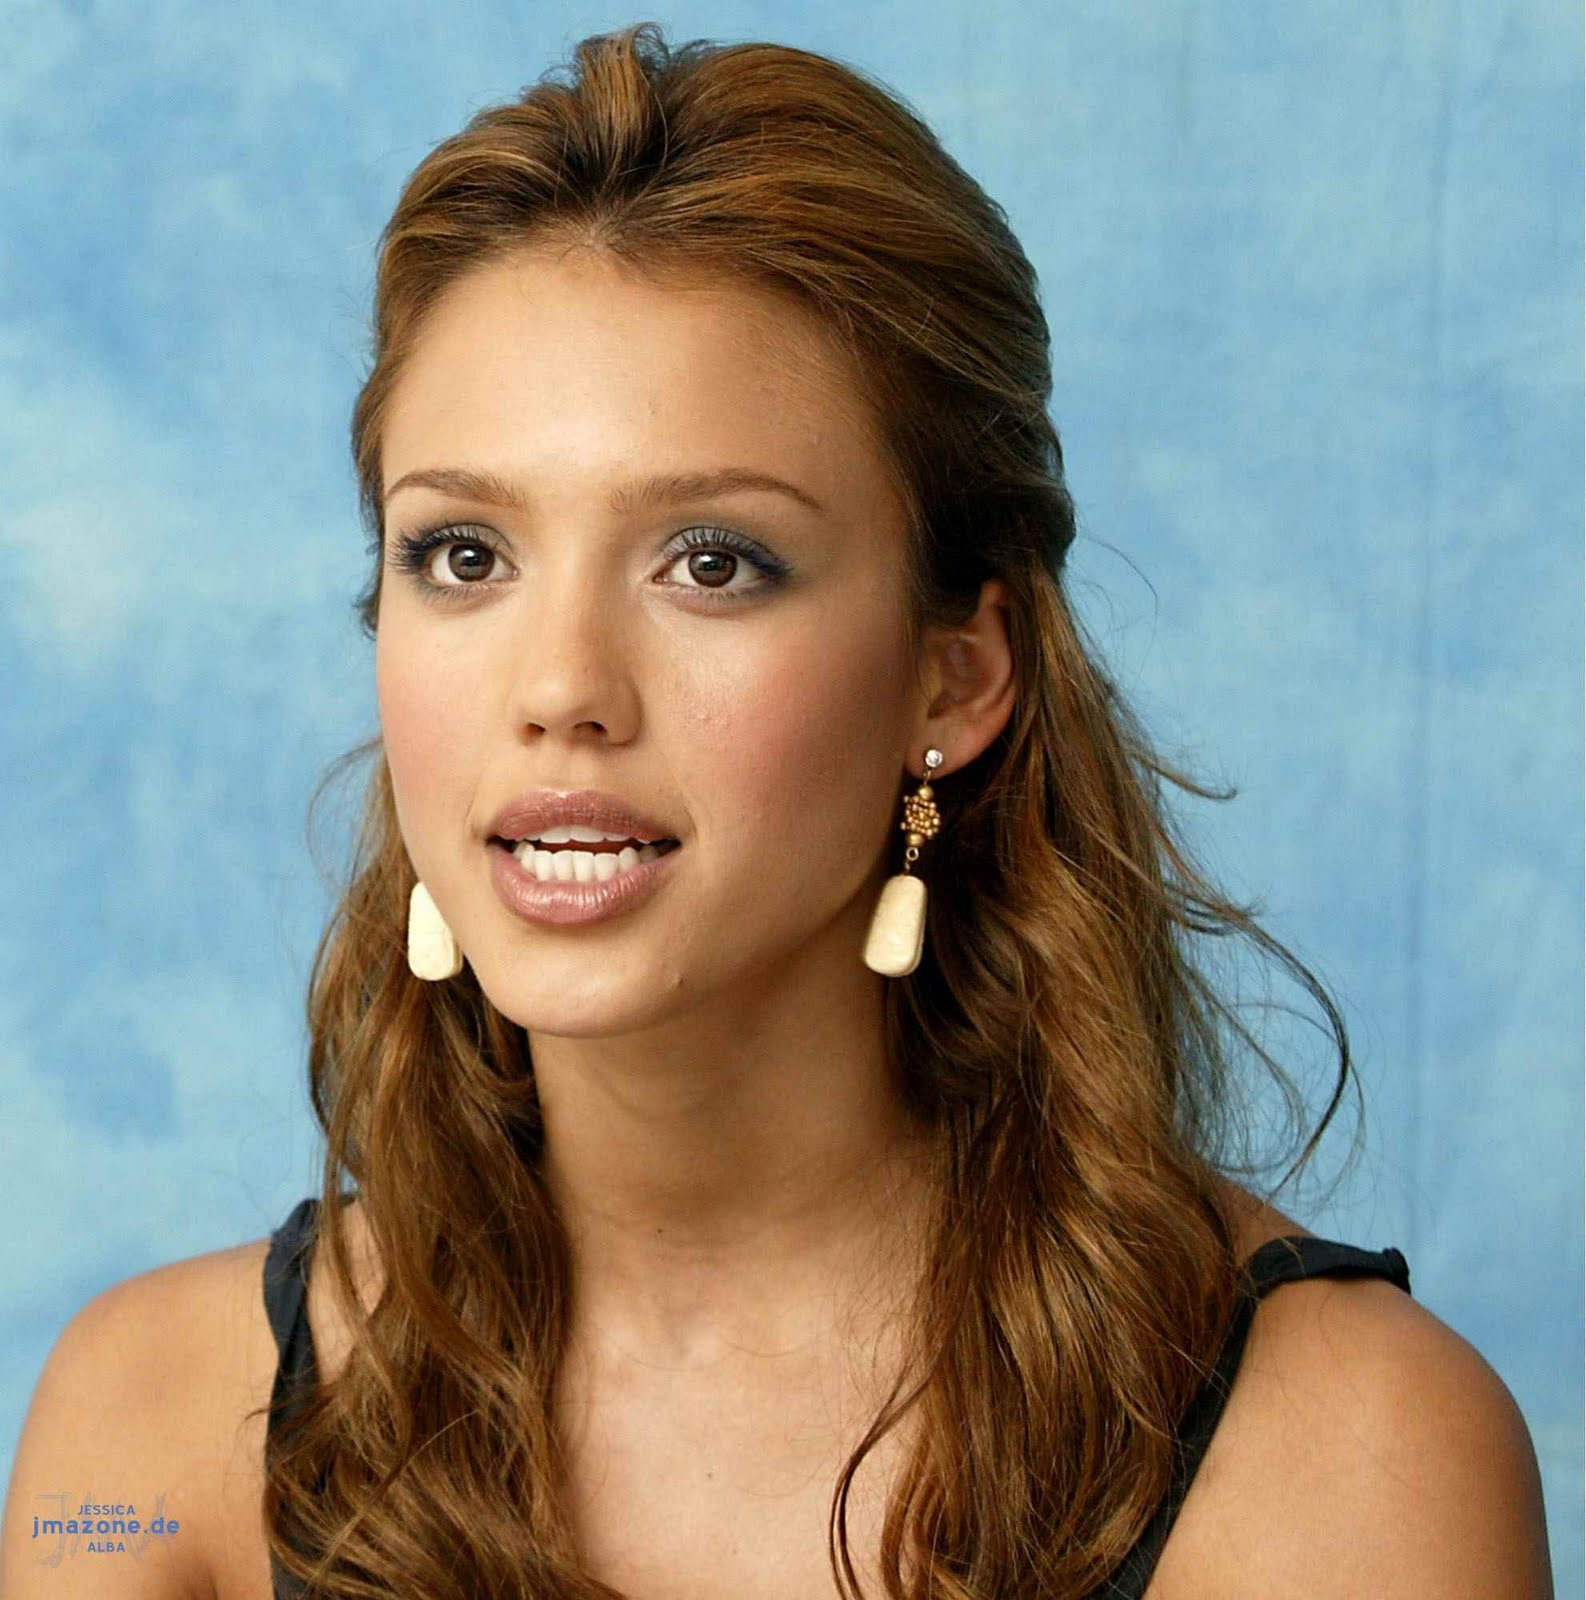 Celebrity Exclusive Showcase: Actress Jessica Alba in Sexy